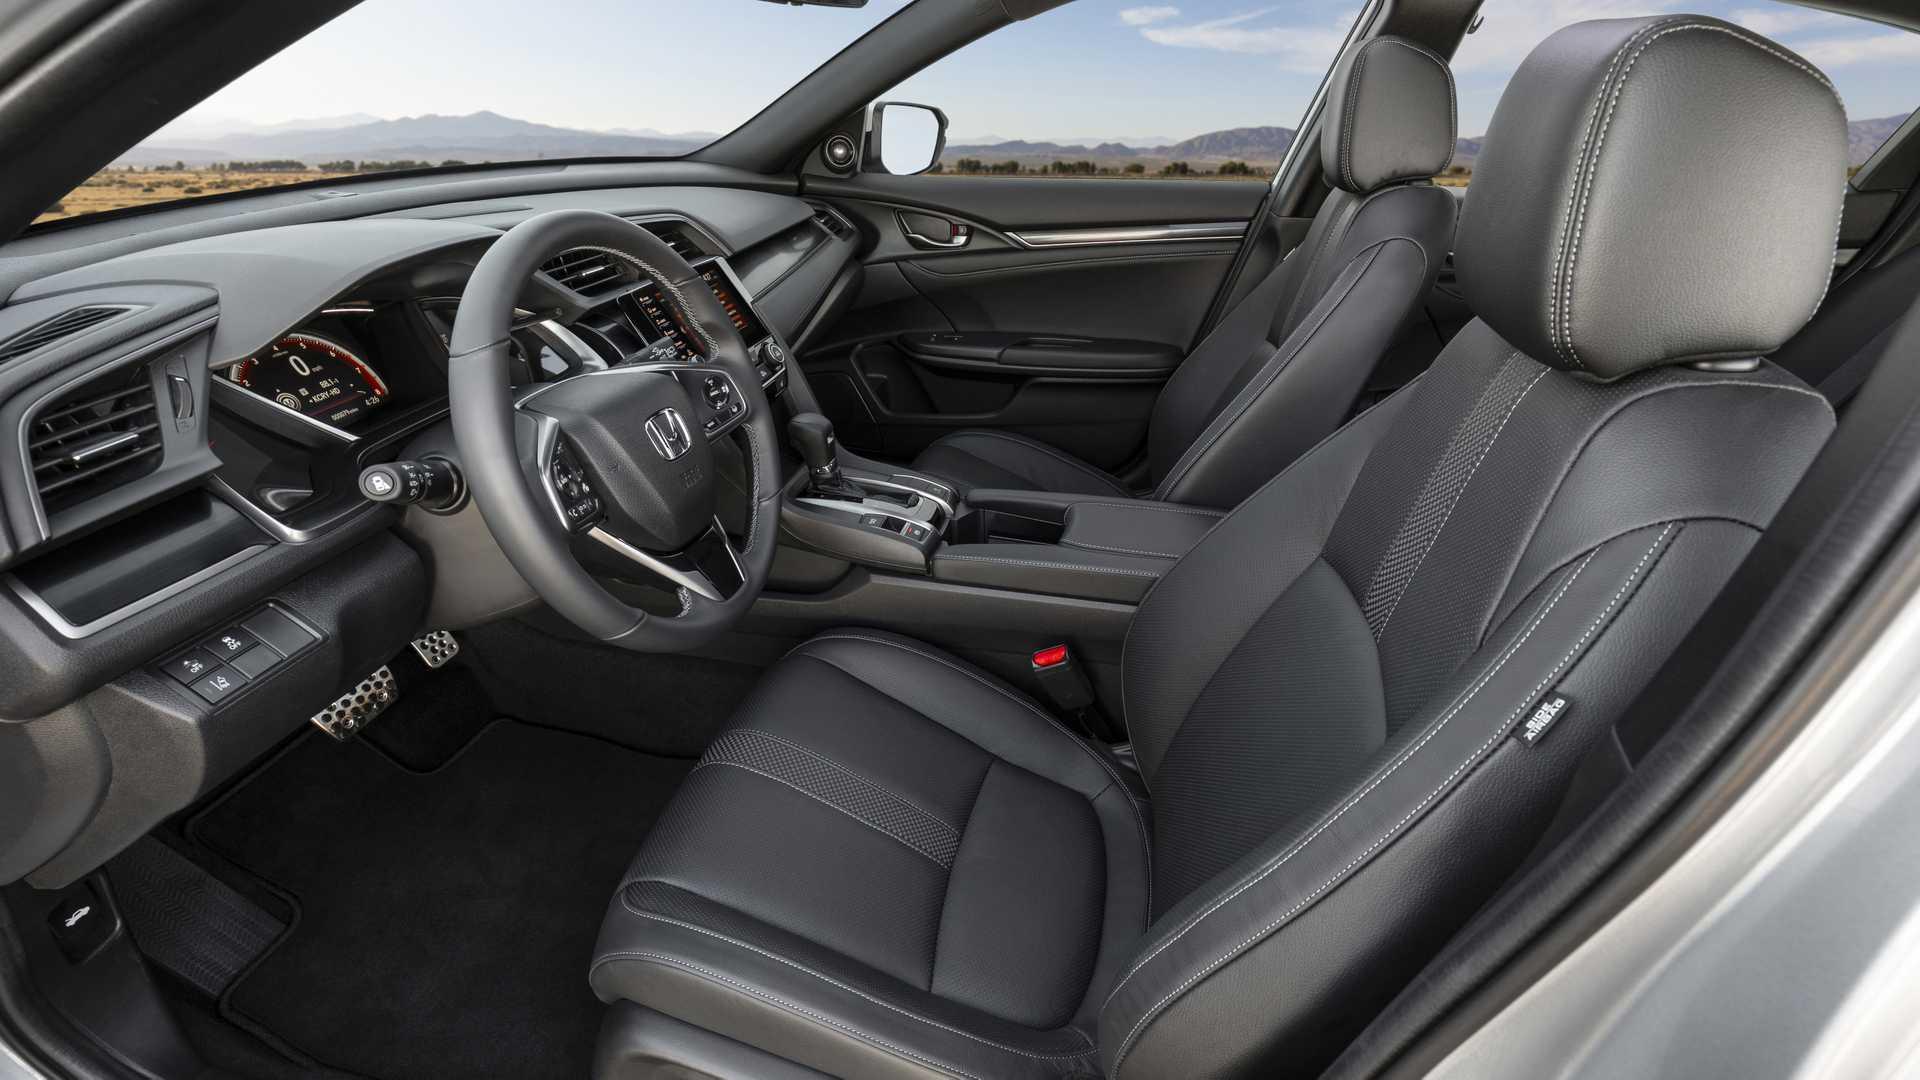 2020 Honda Civic Hatchback Interior Front Seats Wallpapers (8)